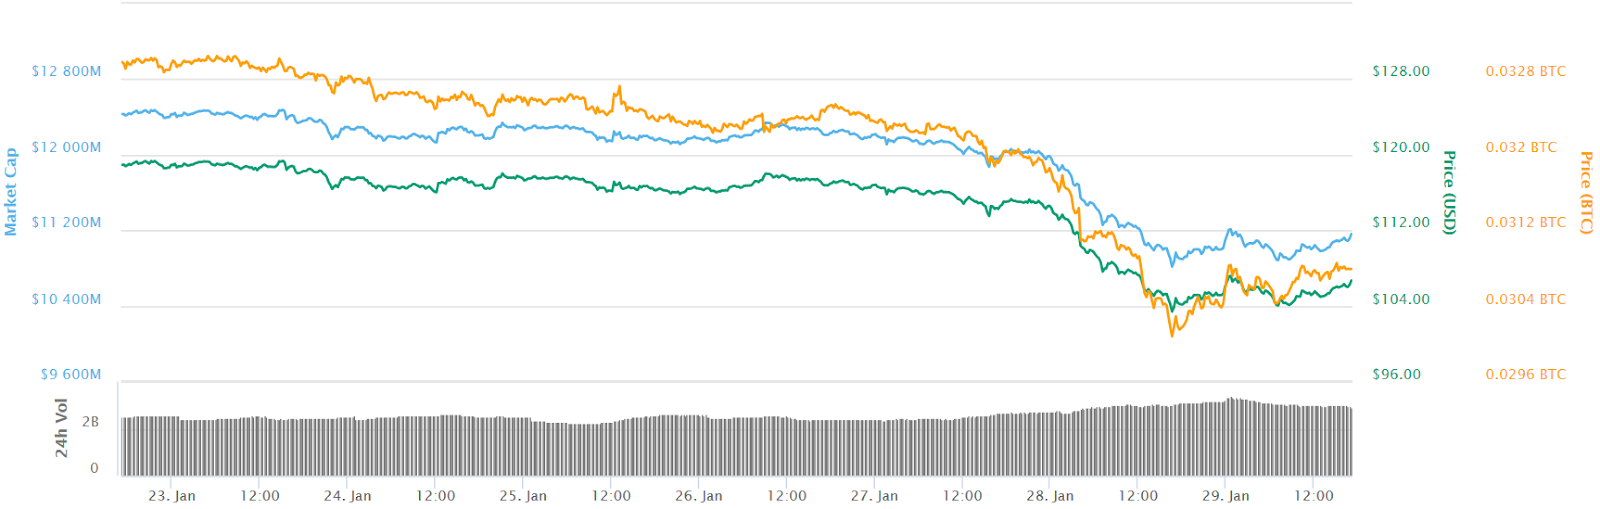 Ethereum 7-day ticket price